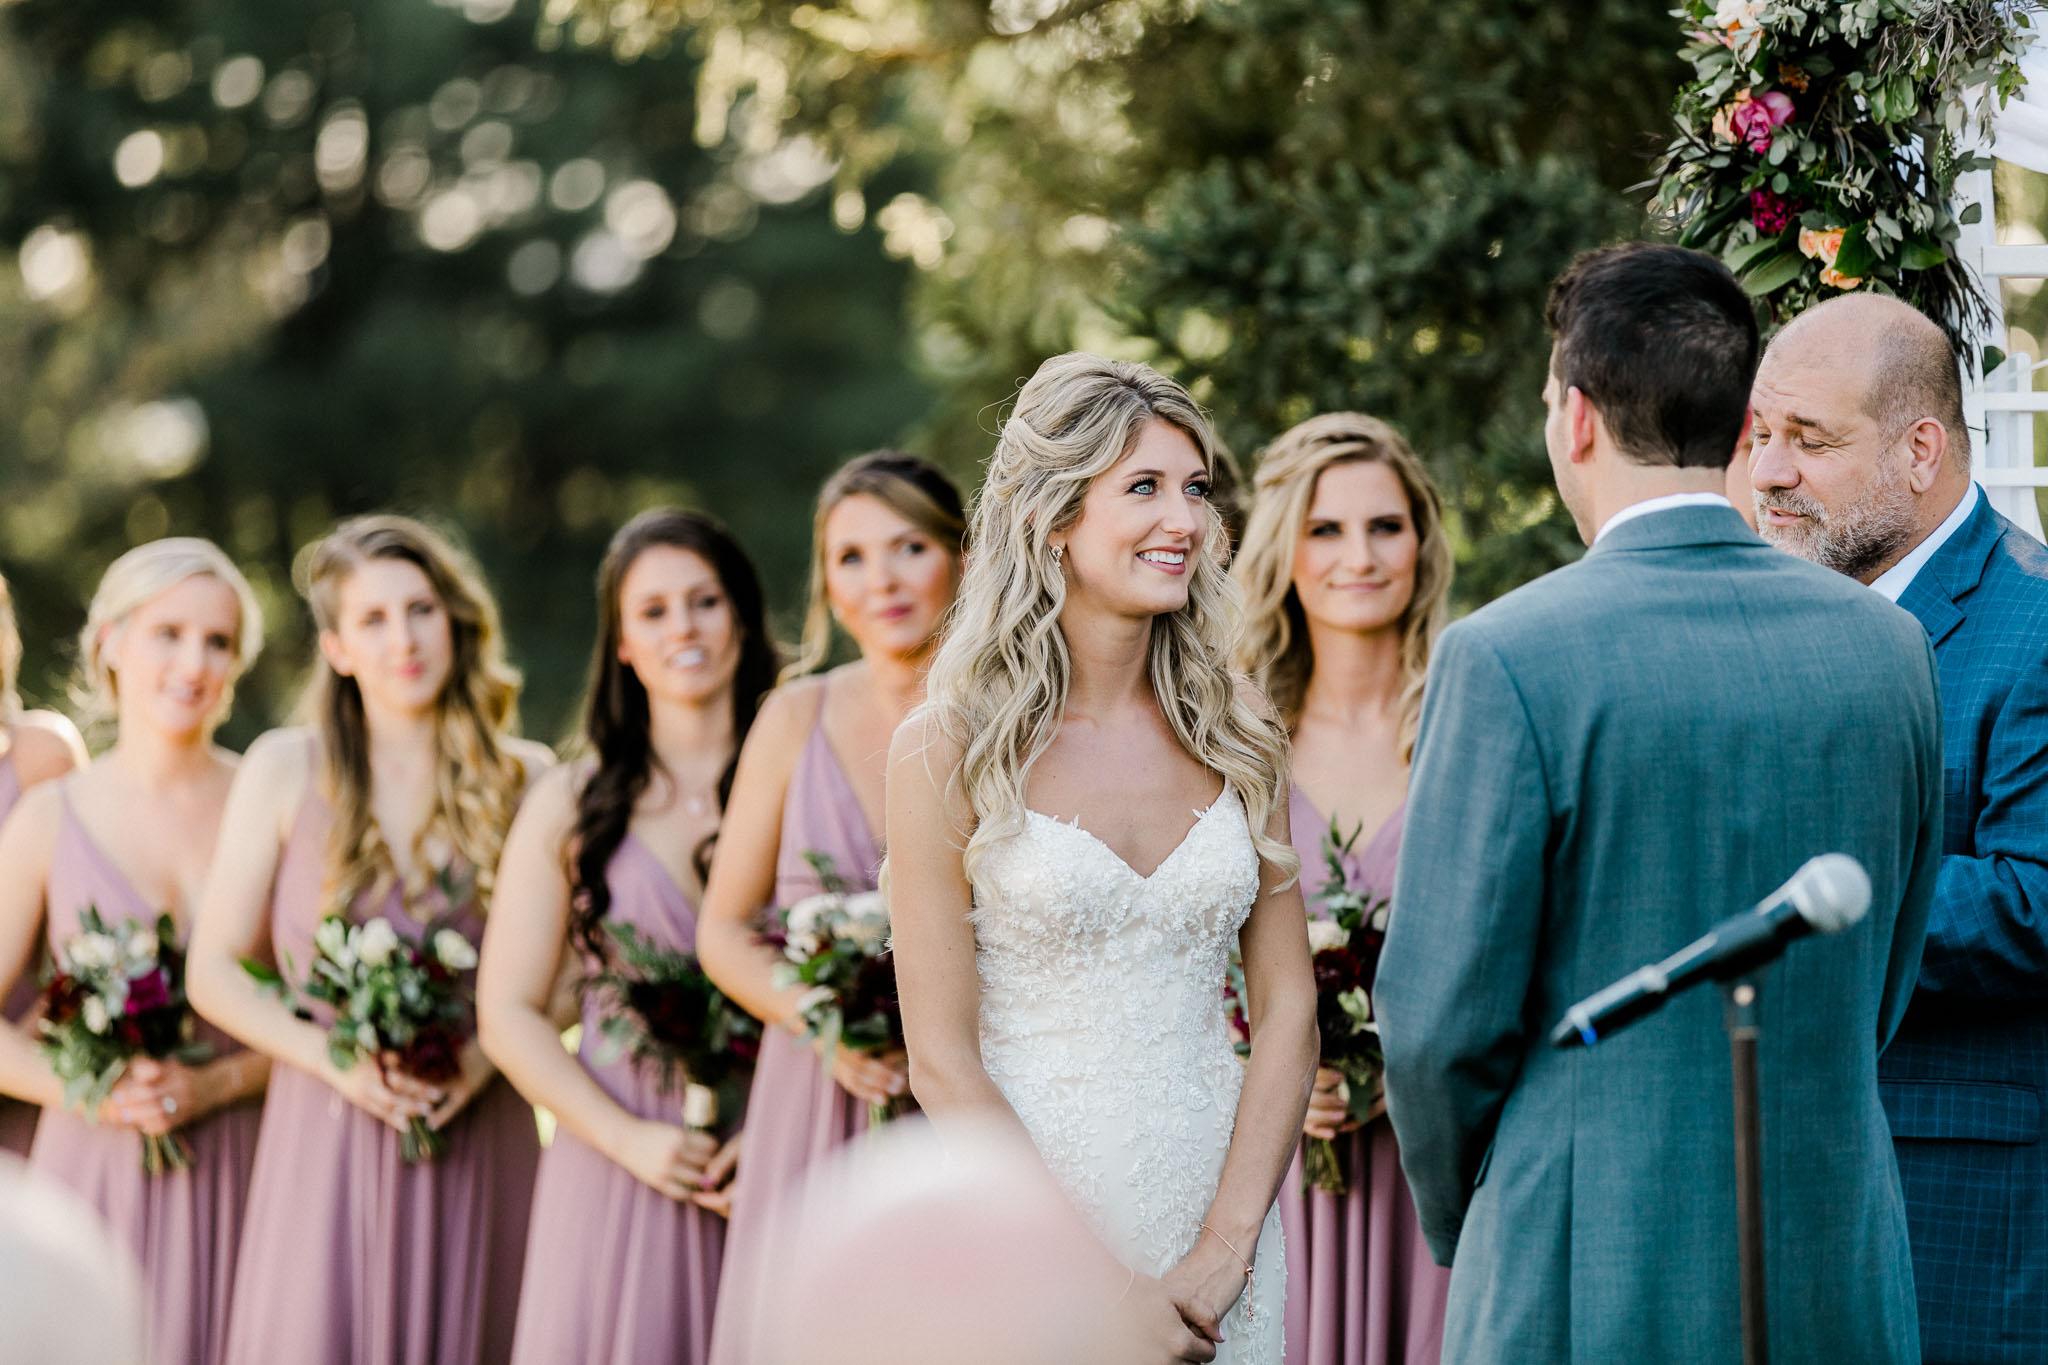 Frosty-Valley-September-Wedding-7994.jpg